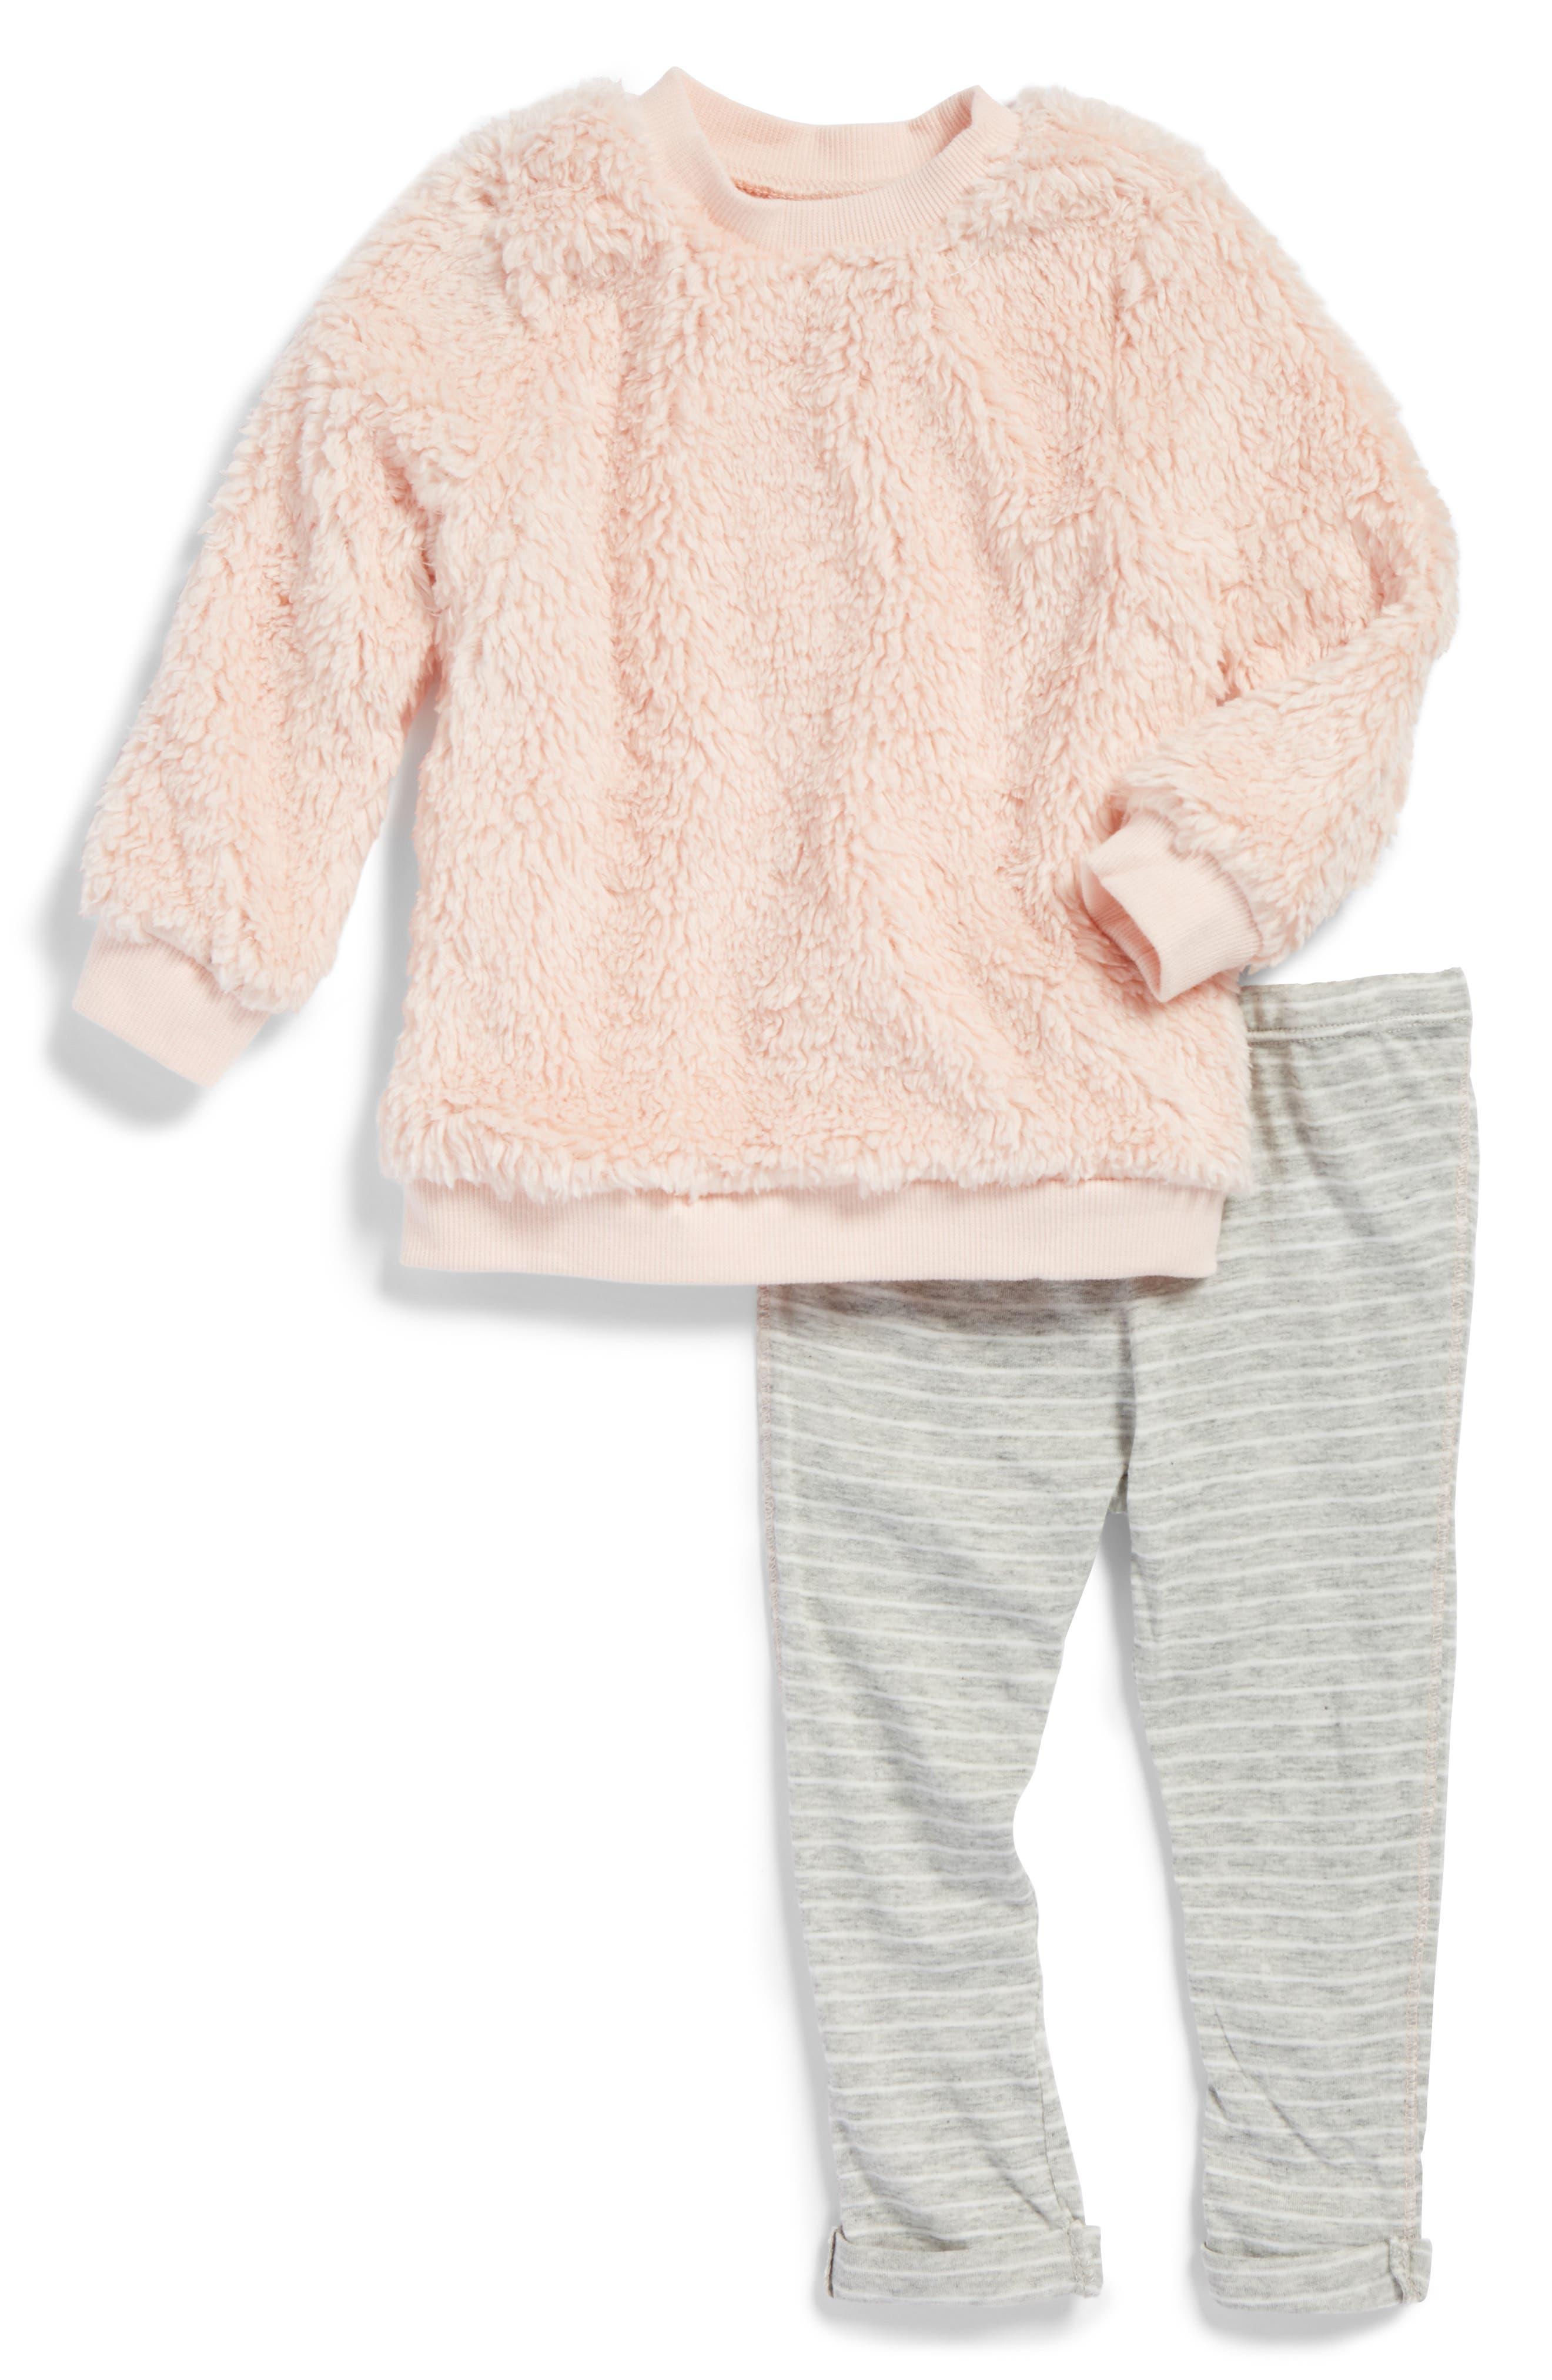 Main Image - Splendid High-Pile Fleece Pullover Sweatshirt & Leggings Set (Baby Girls)